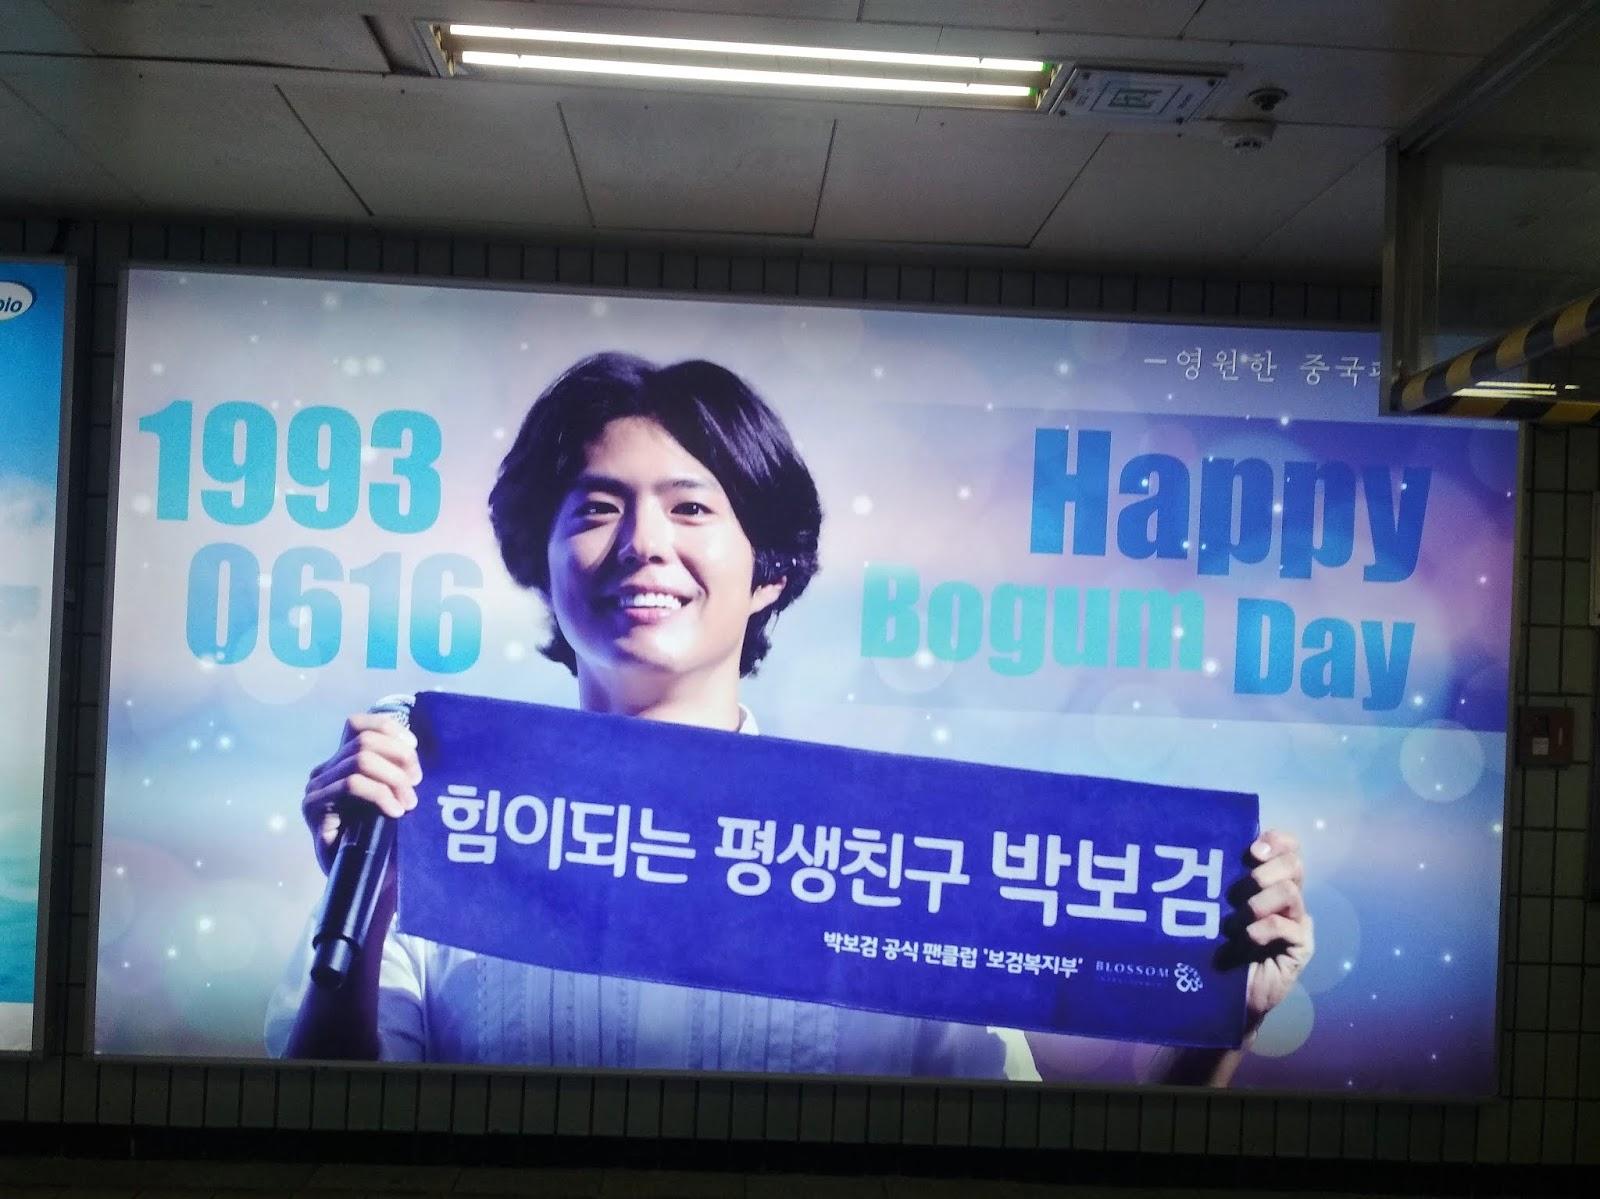 How to Learn Korean: Korean Drama Scripts/Transcripts (Free